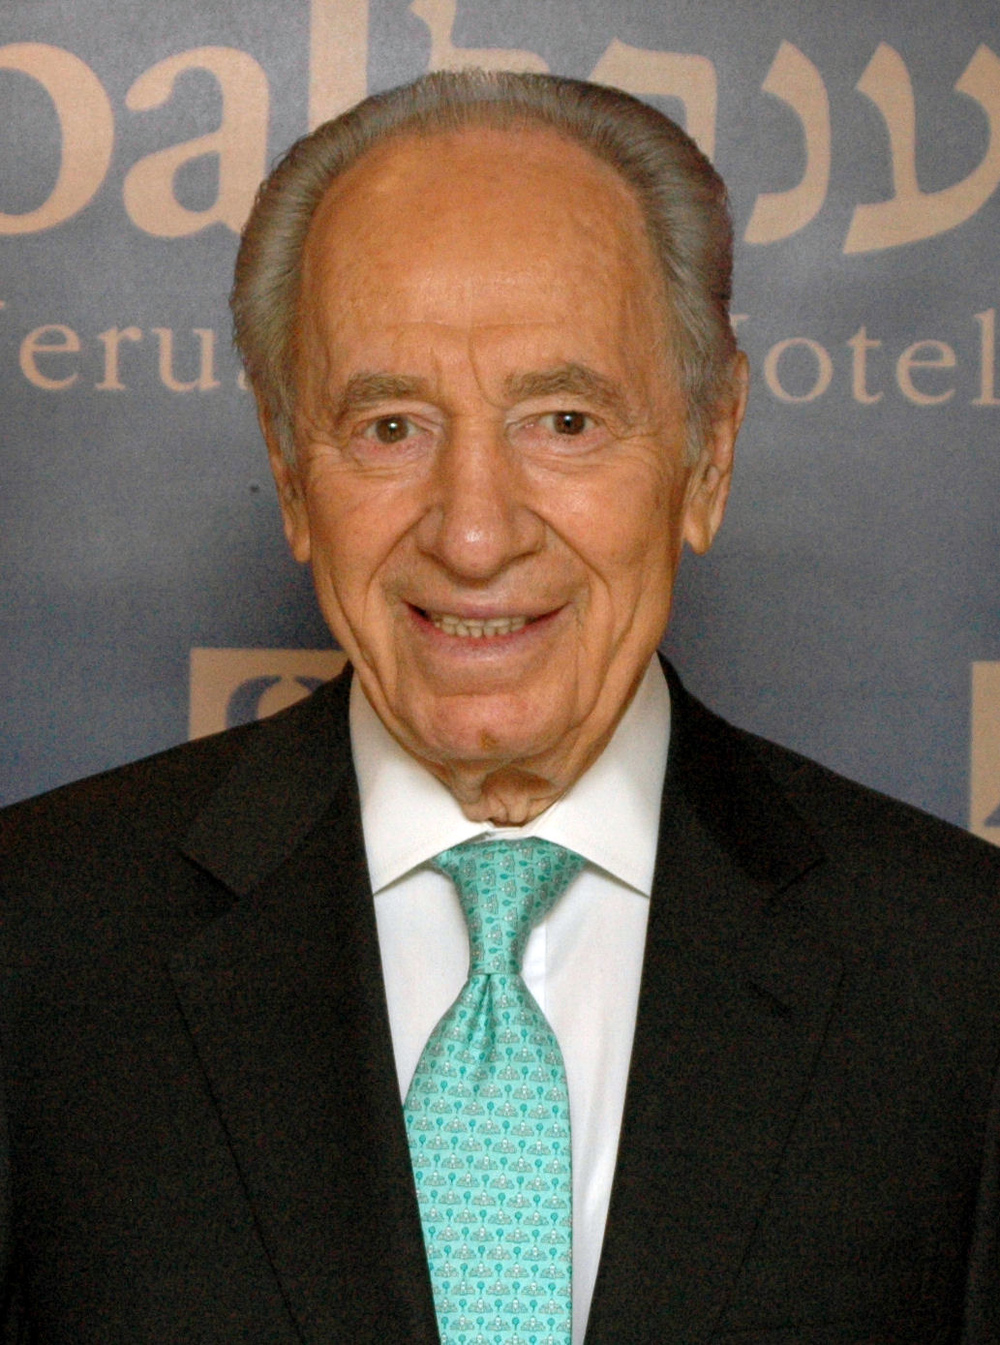 Former Israeli President Shimon Peres. Credit:Michael Thaidigsmann via Wikimedia Commons.